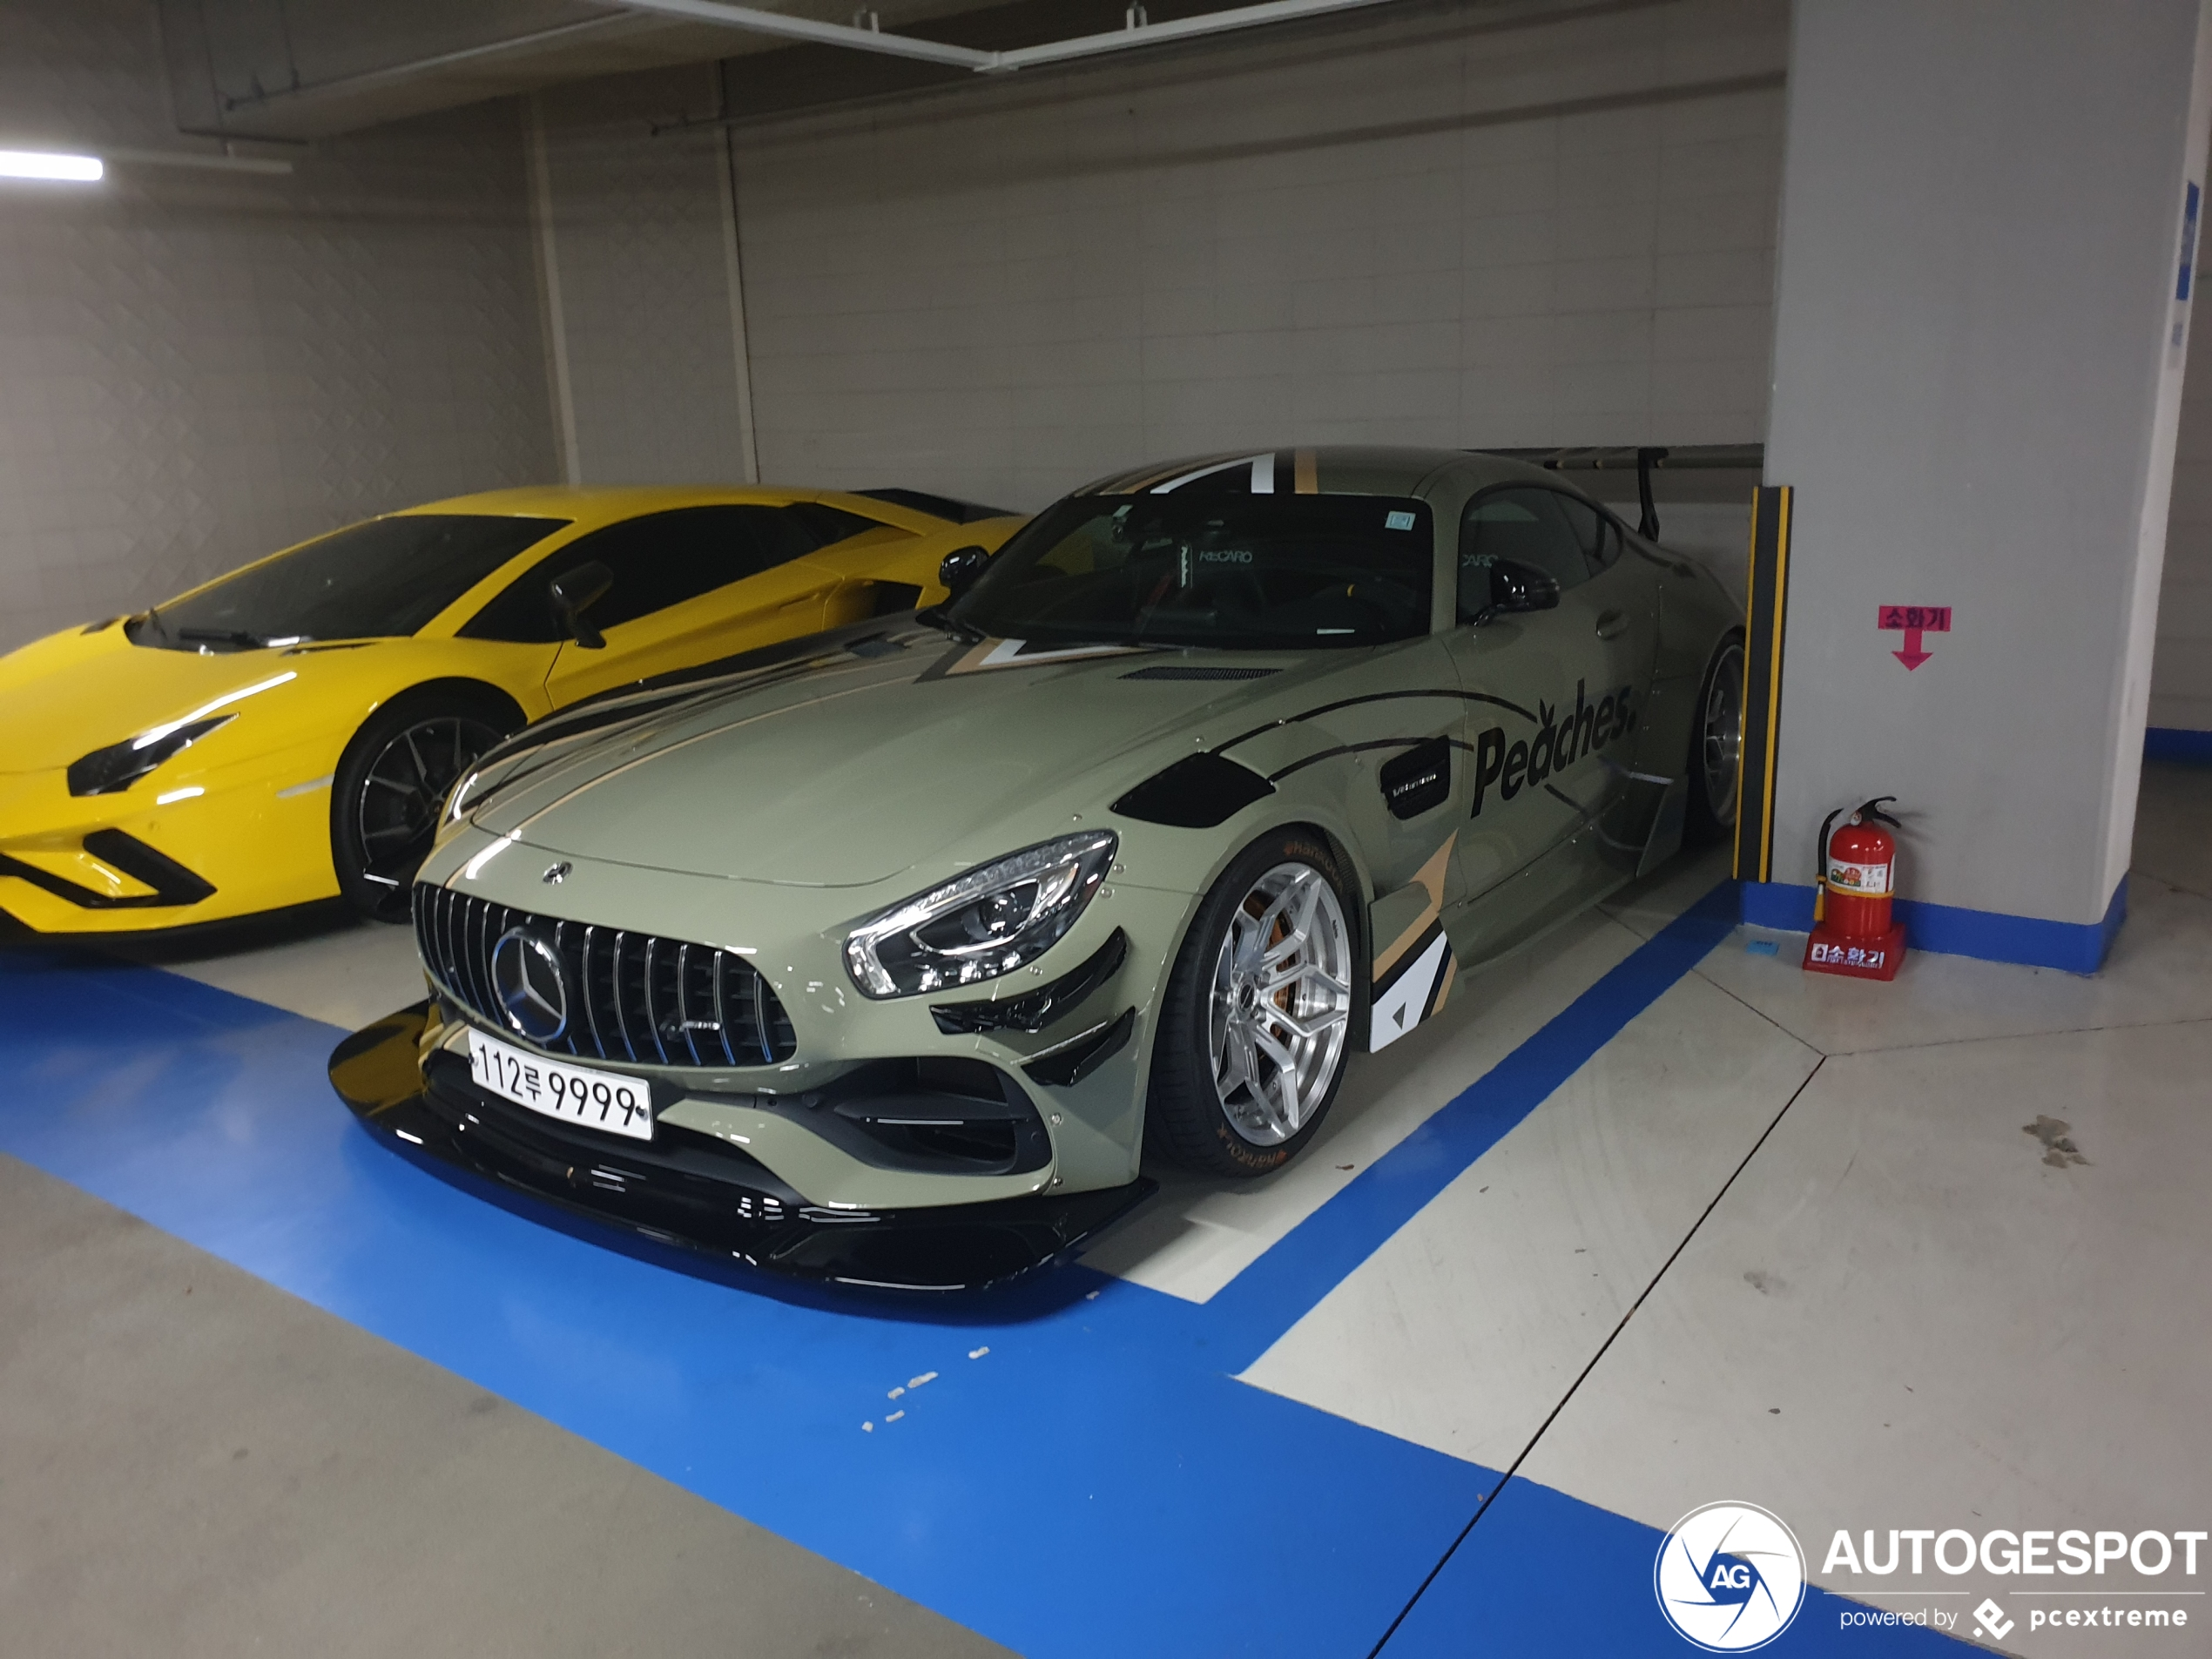 Mercedes-AMG GT C uitgedost als racemonster